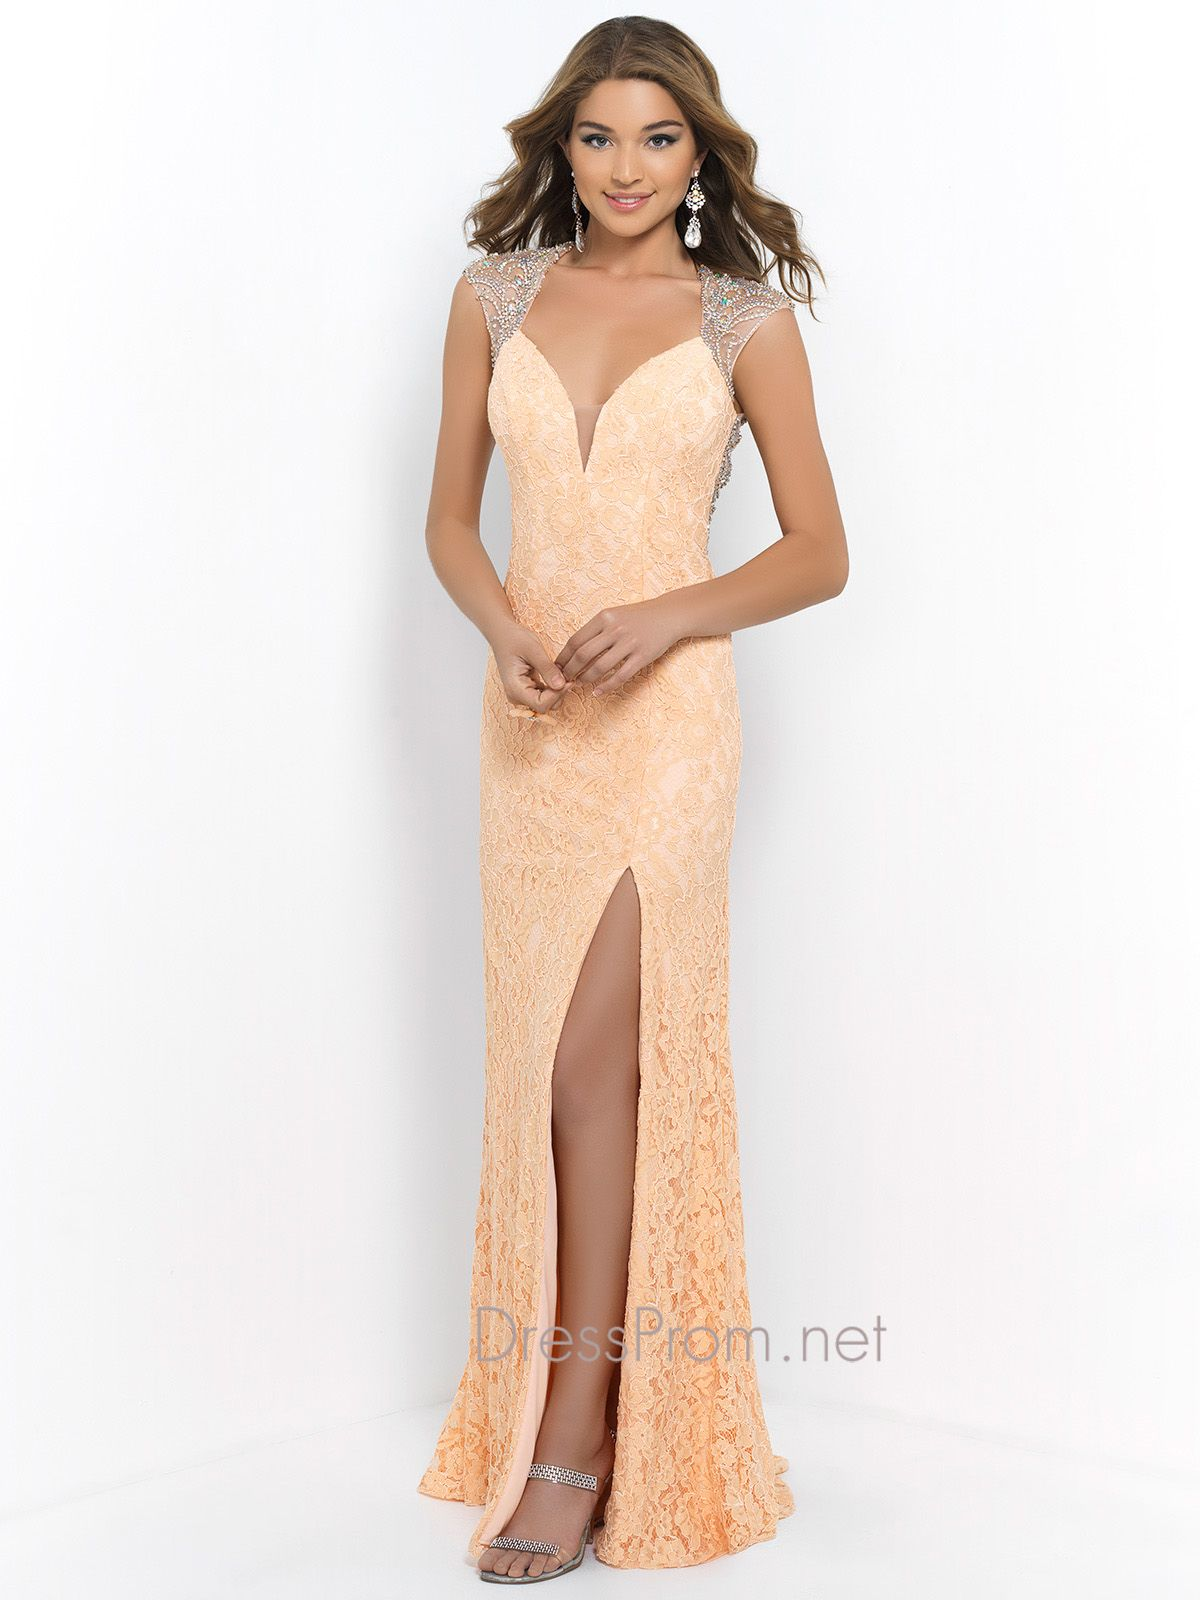 Vintage-Inspired Evening Gowns Dresse